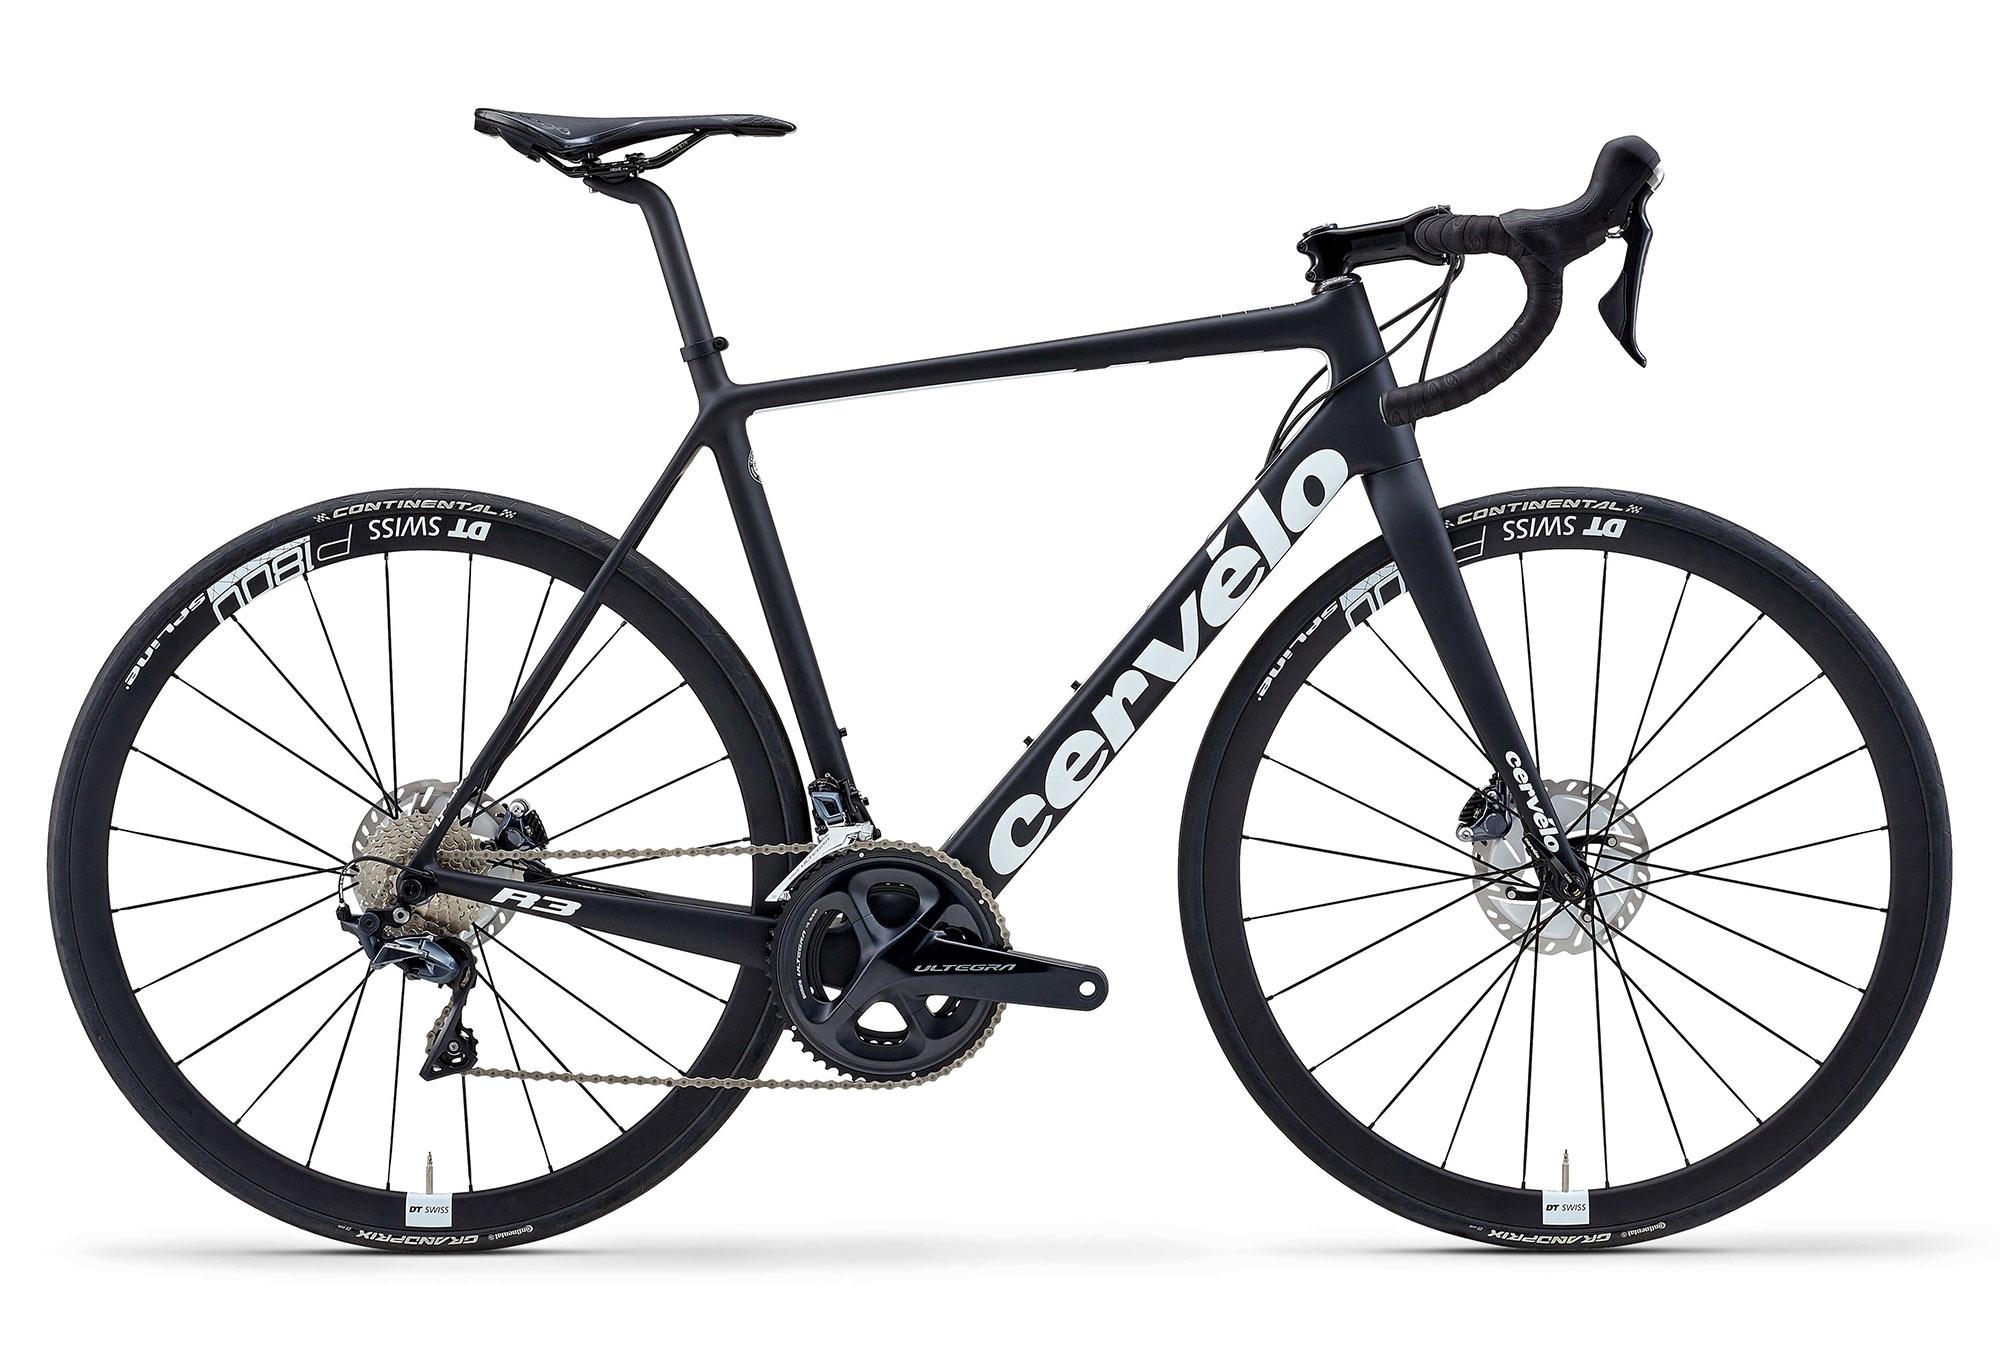 Cervélo R3 Disc Road Bike Shimano Ultegra 8020 11S Black